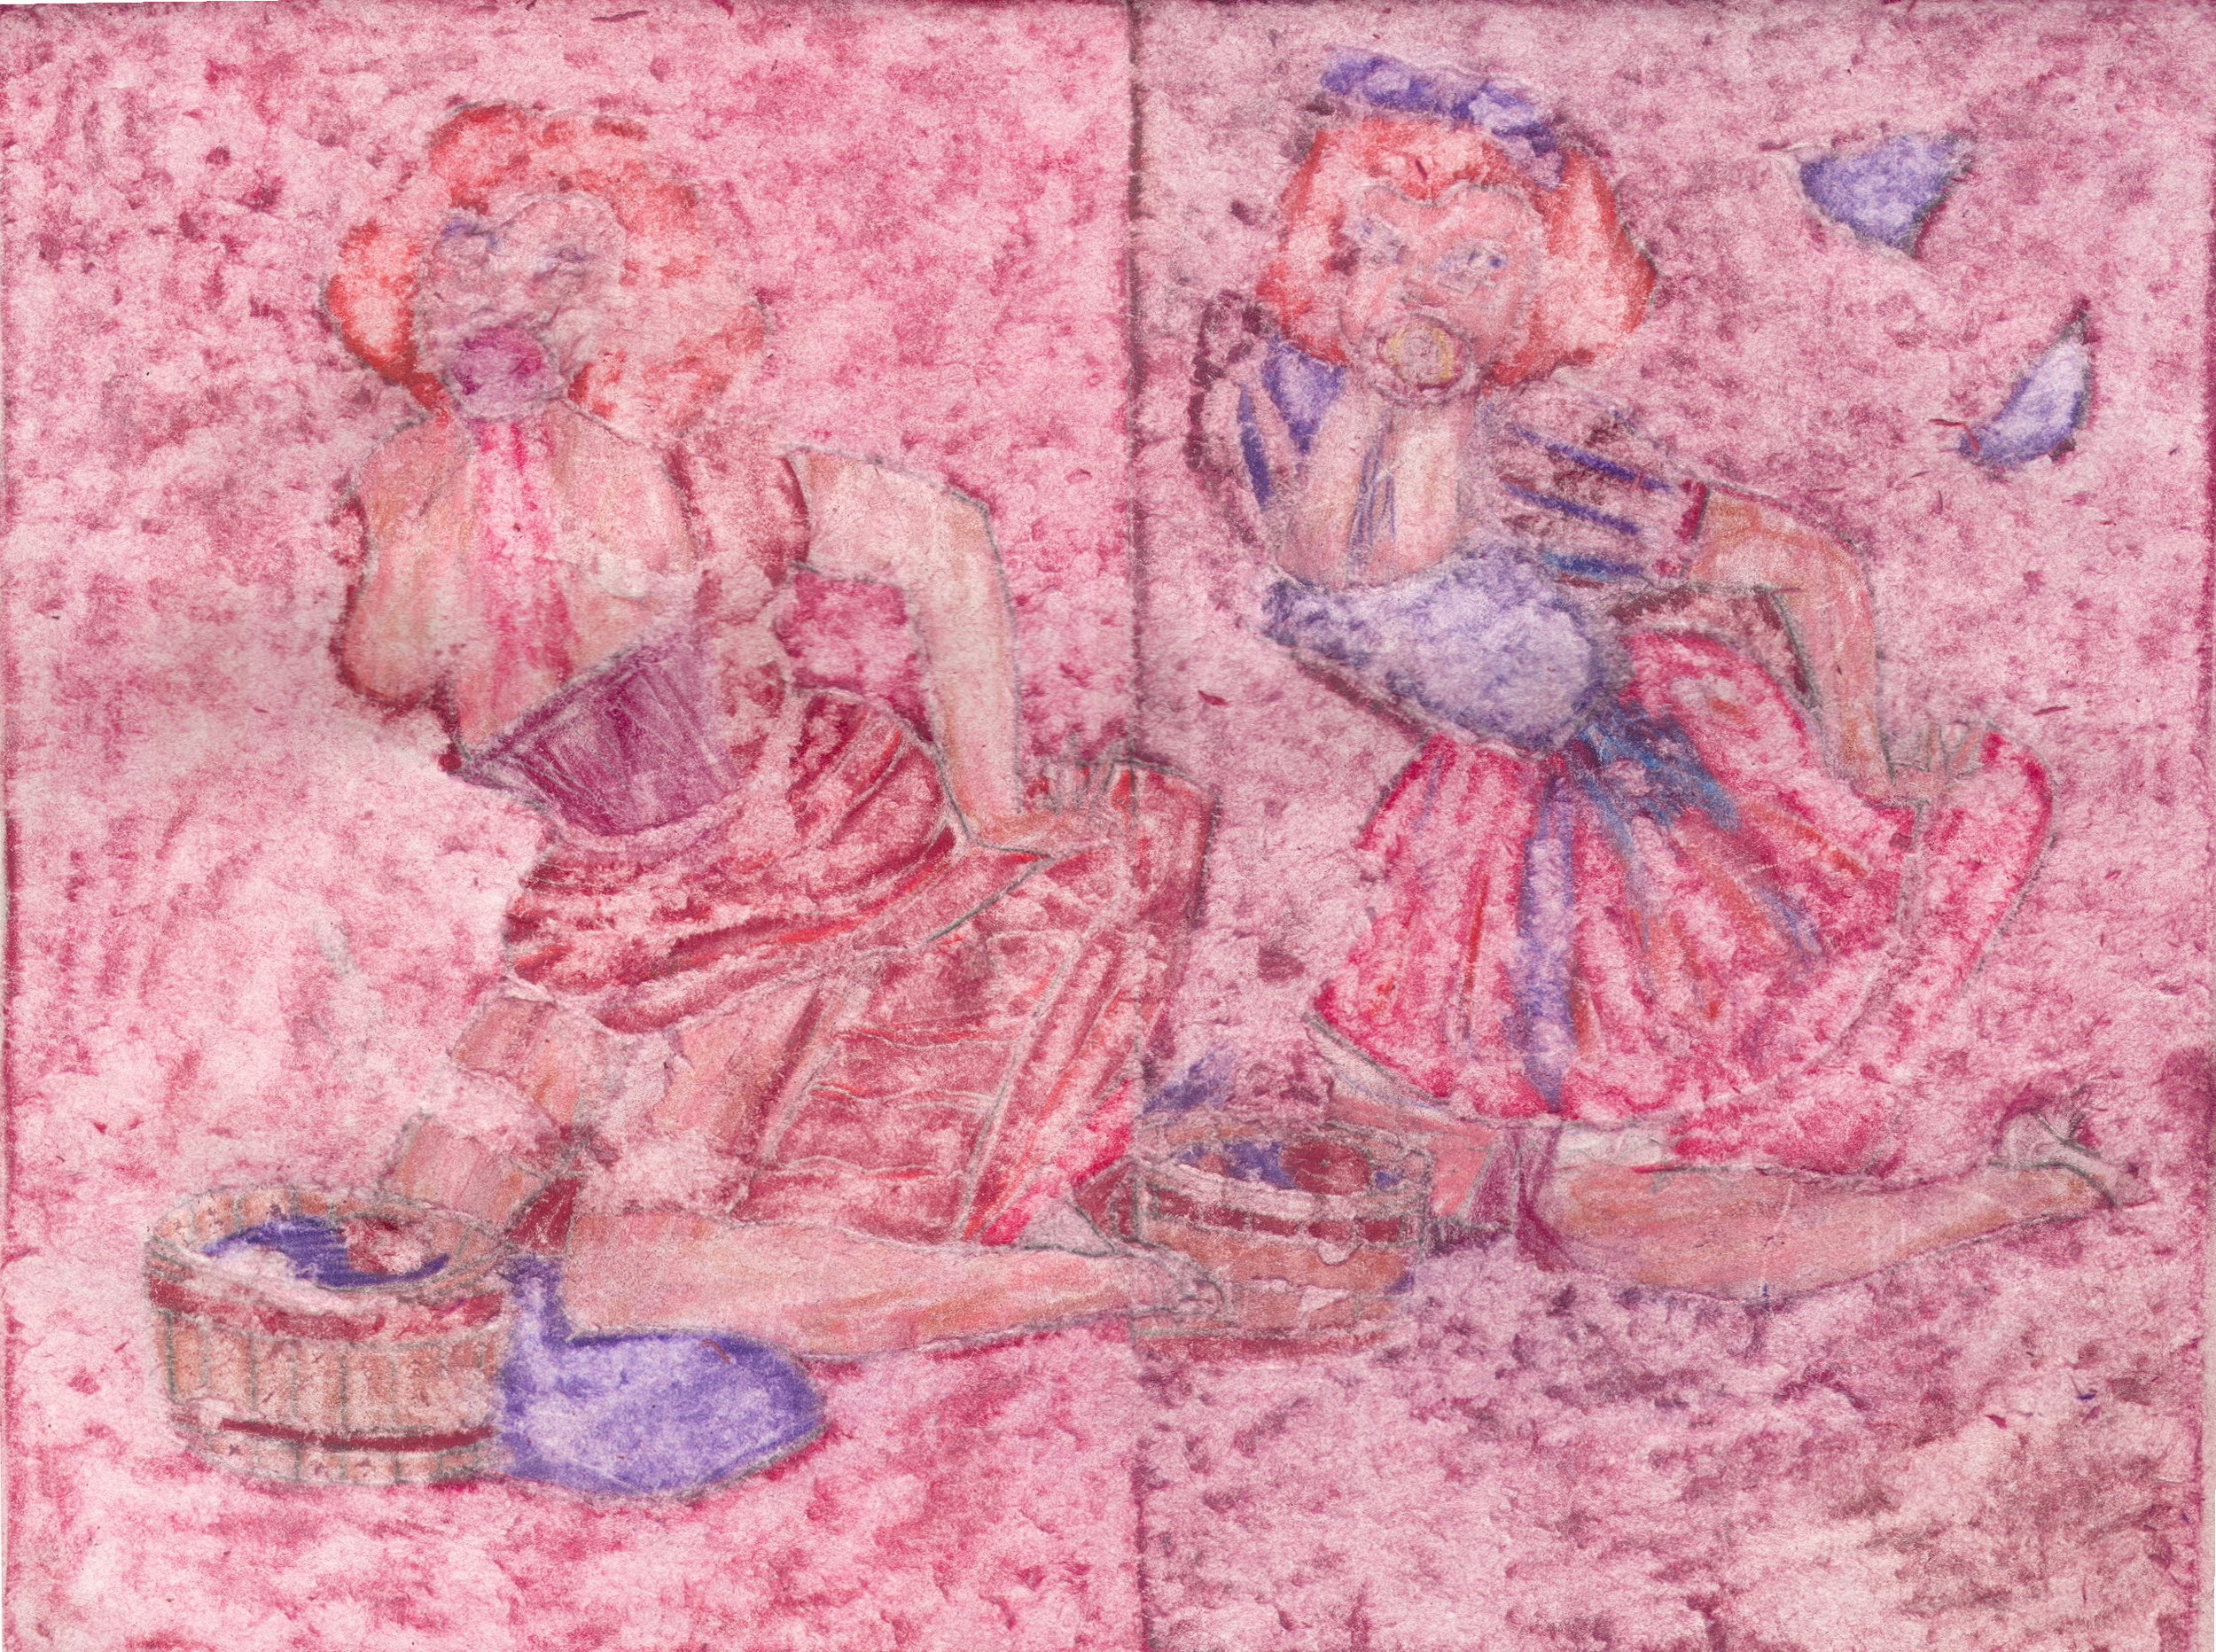 O.T. ( Pinup Fairy Tale III ), 2019  Buntstift auf Papier, 26x35.5cm